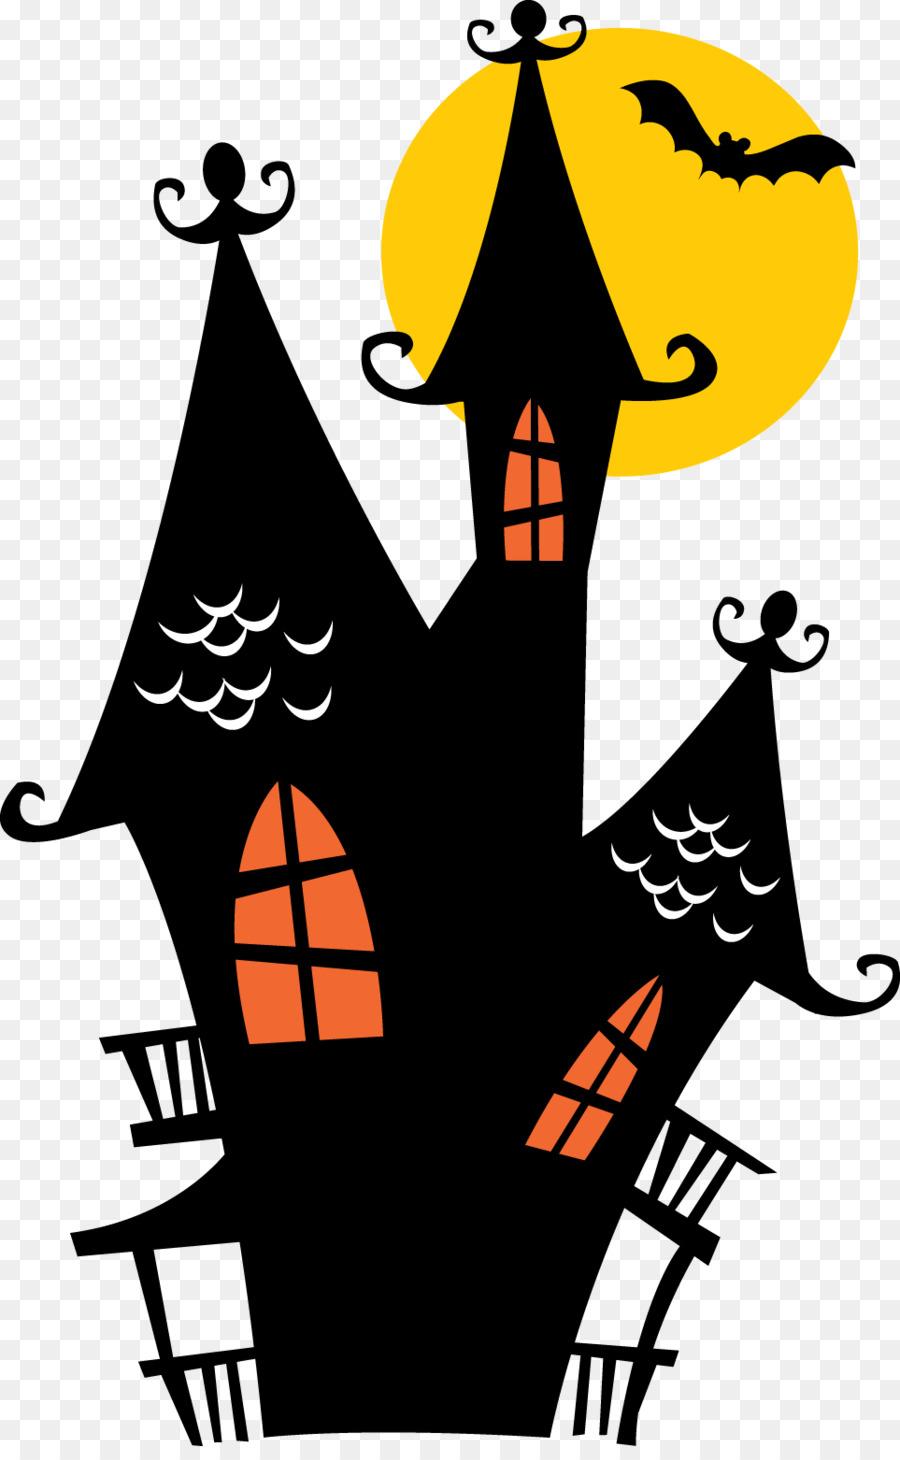 Haunted House Cartoon clipart.